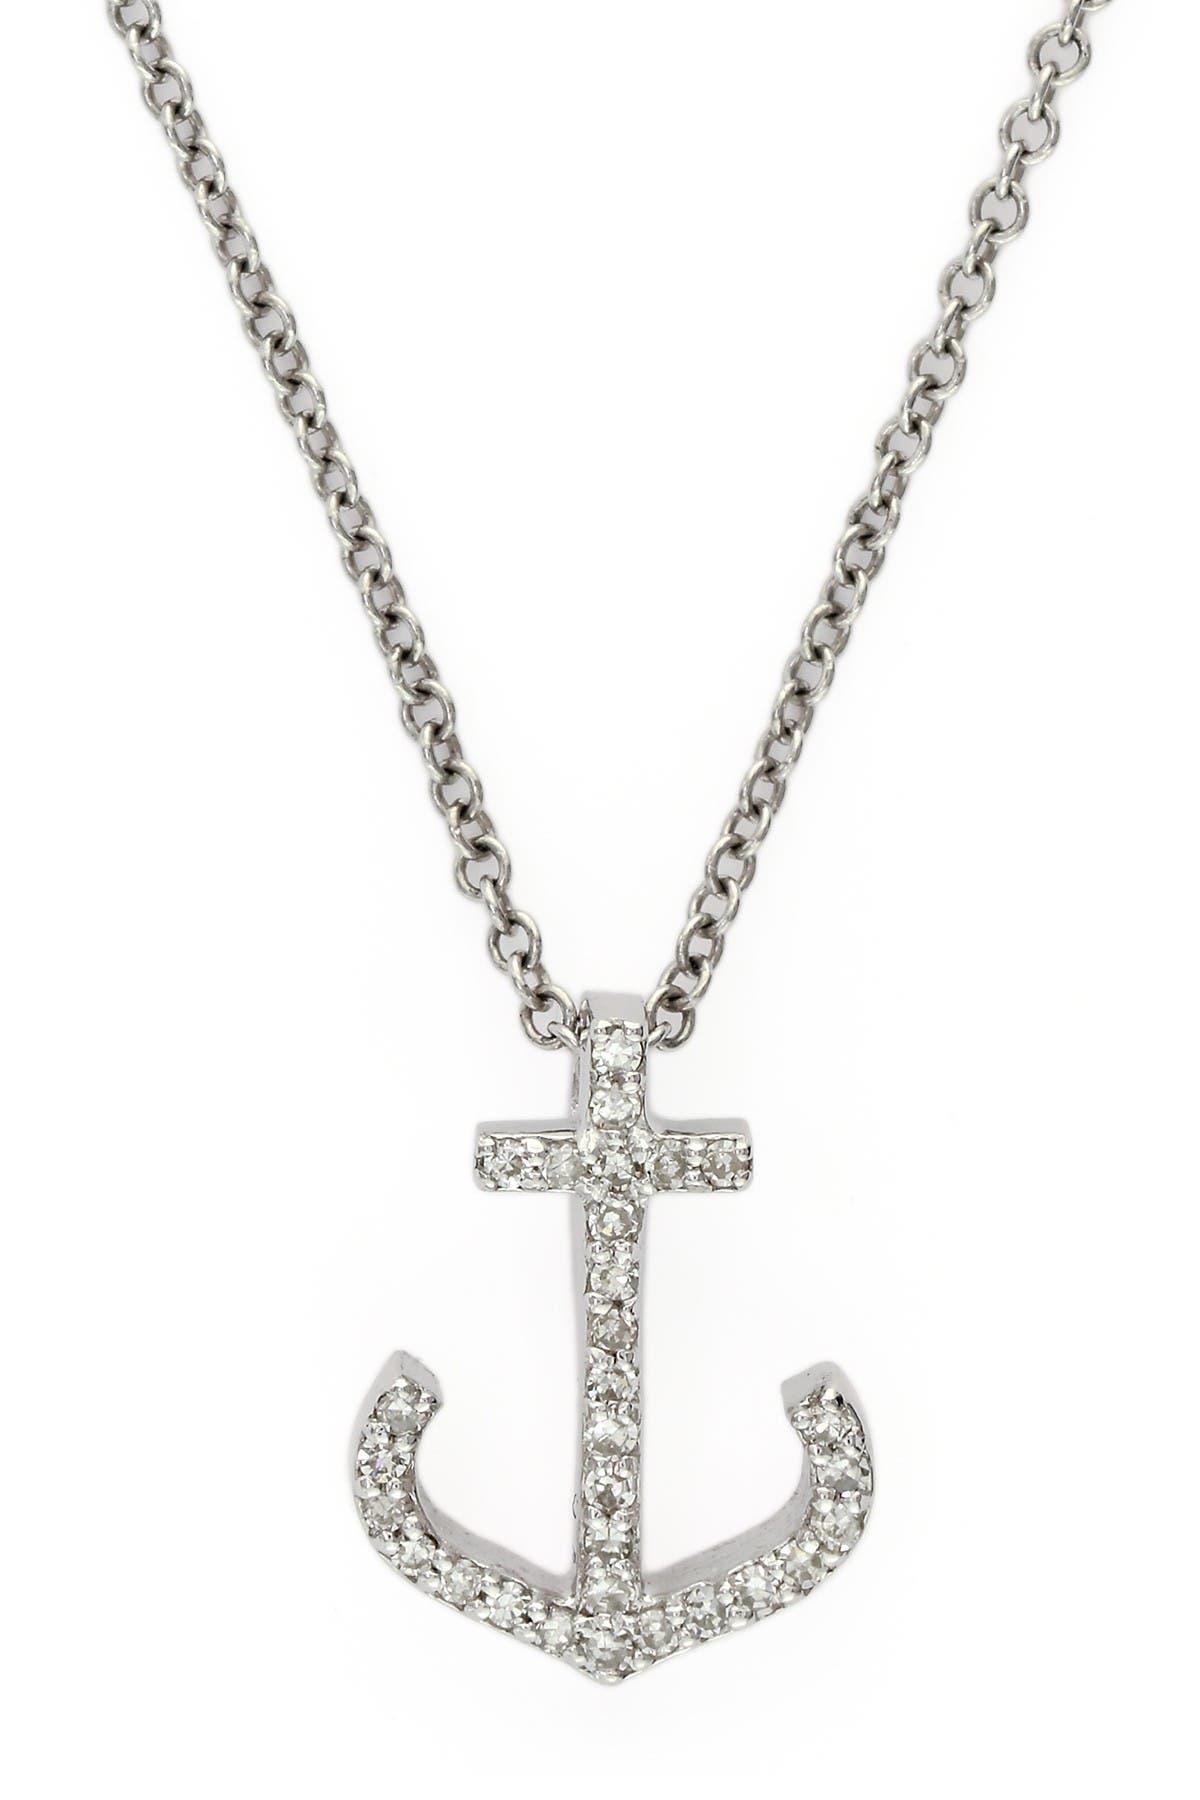 Image of Effy 14K White Gold Pave Diamond Anchor Pendant Necklace - 0.09 ctw